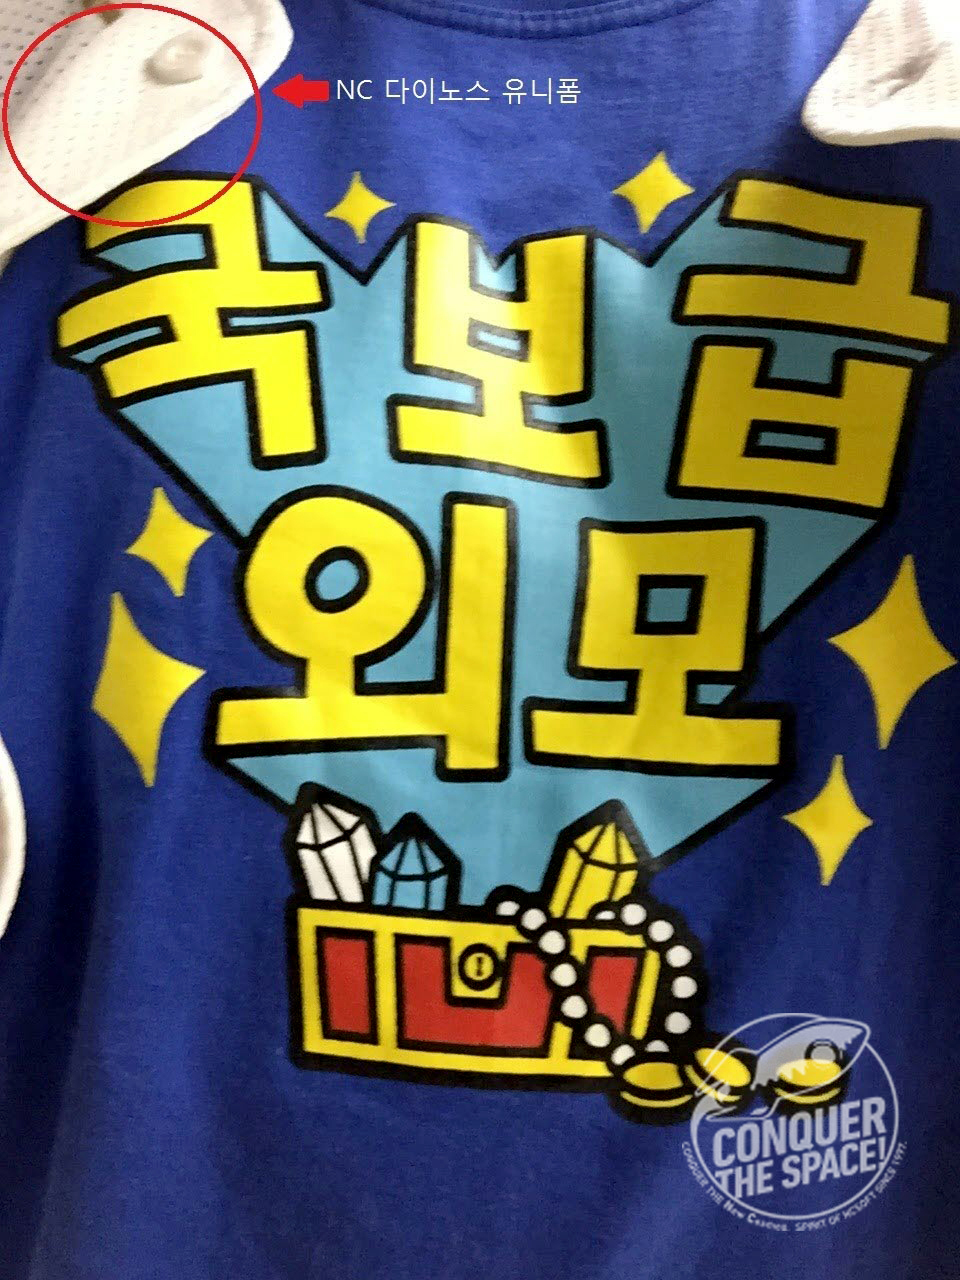 NC 다이노스 유니폼과 국보급 외모 티셔츠